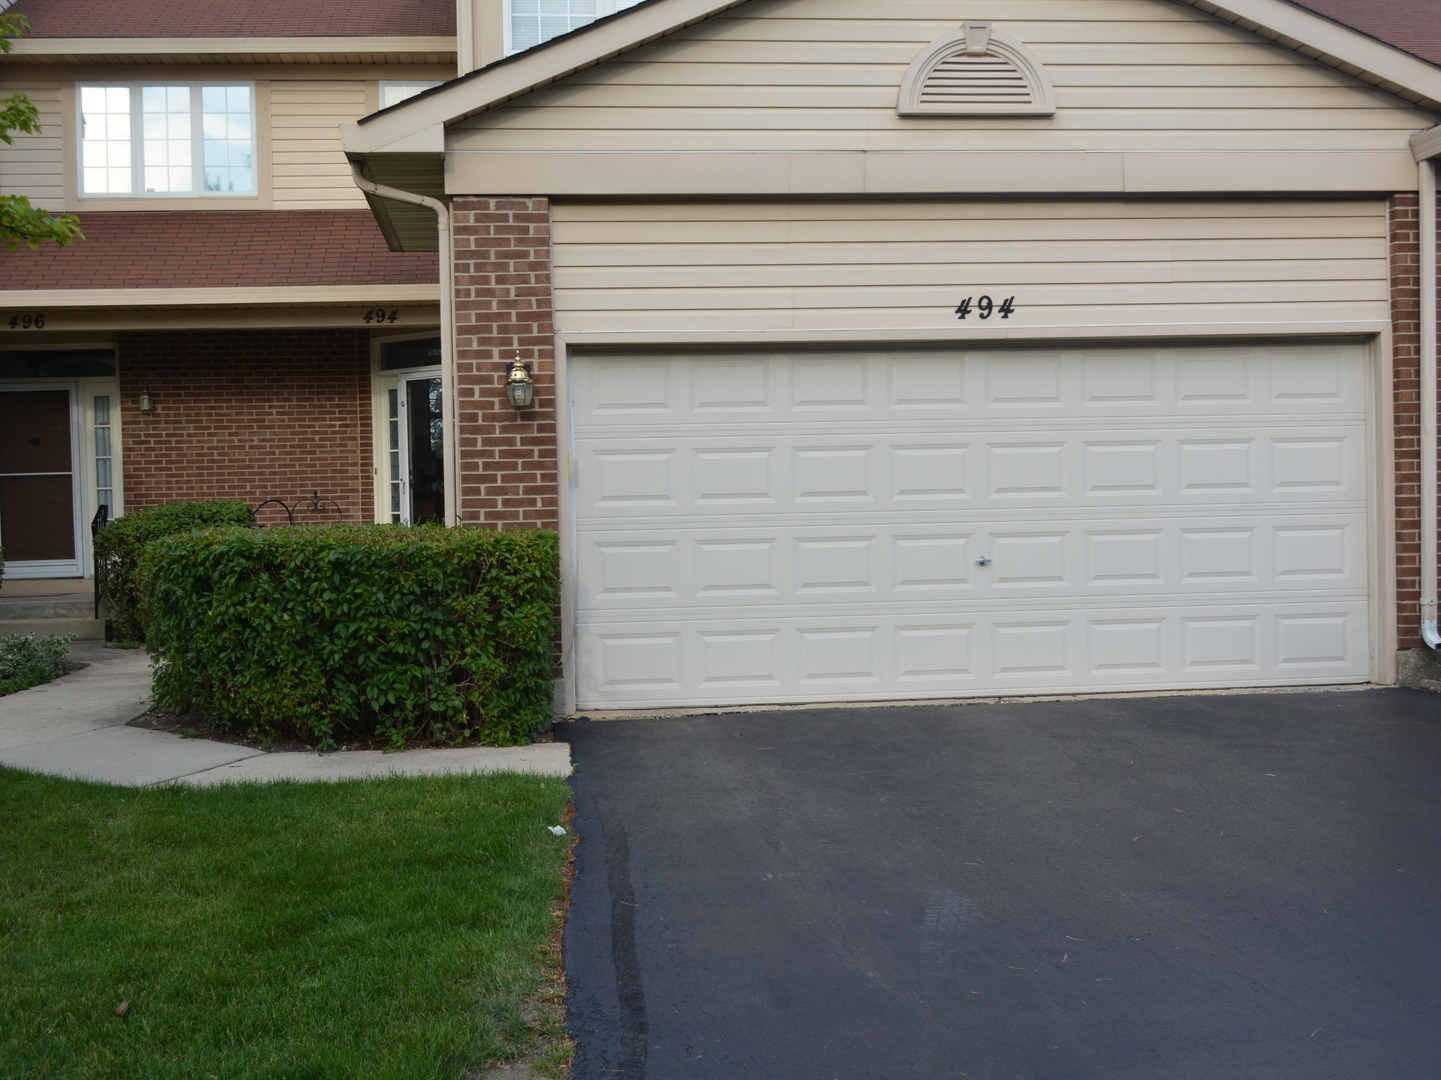 494 Parkside ,Palatine, Illinois 60067